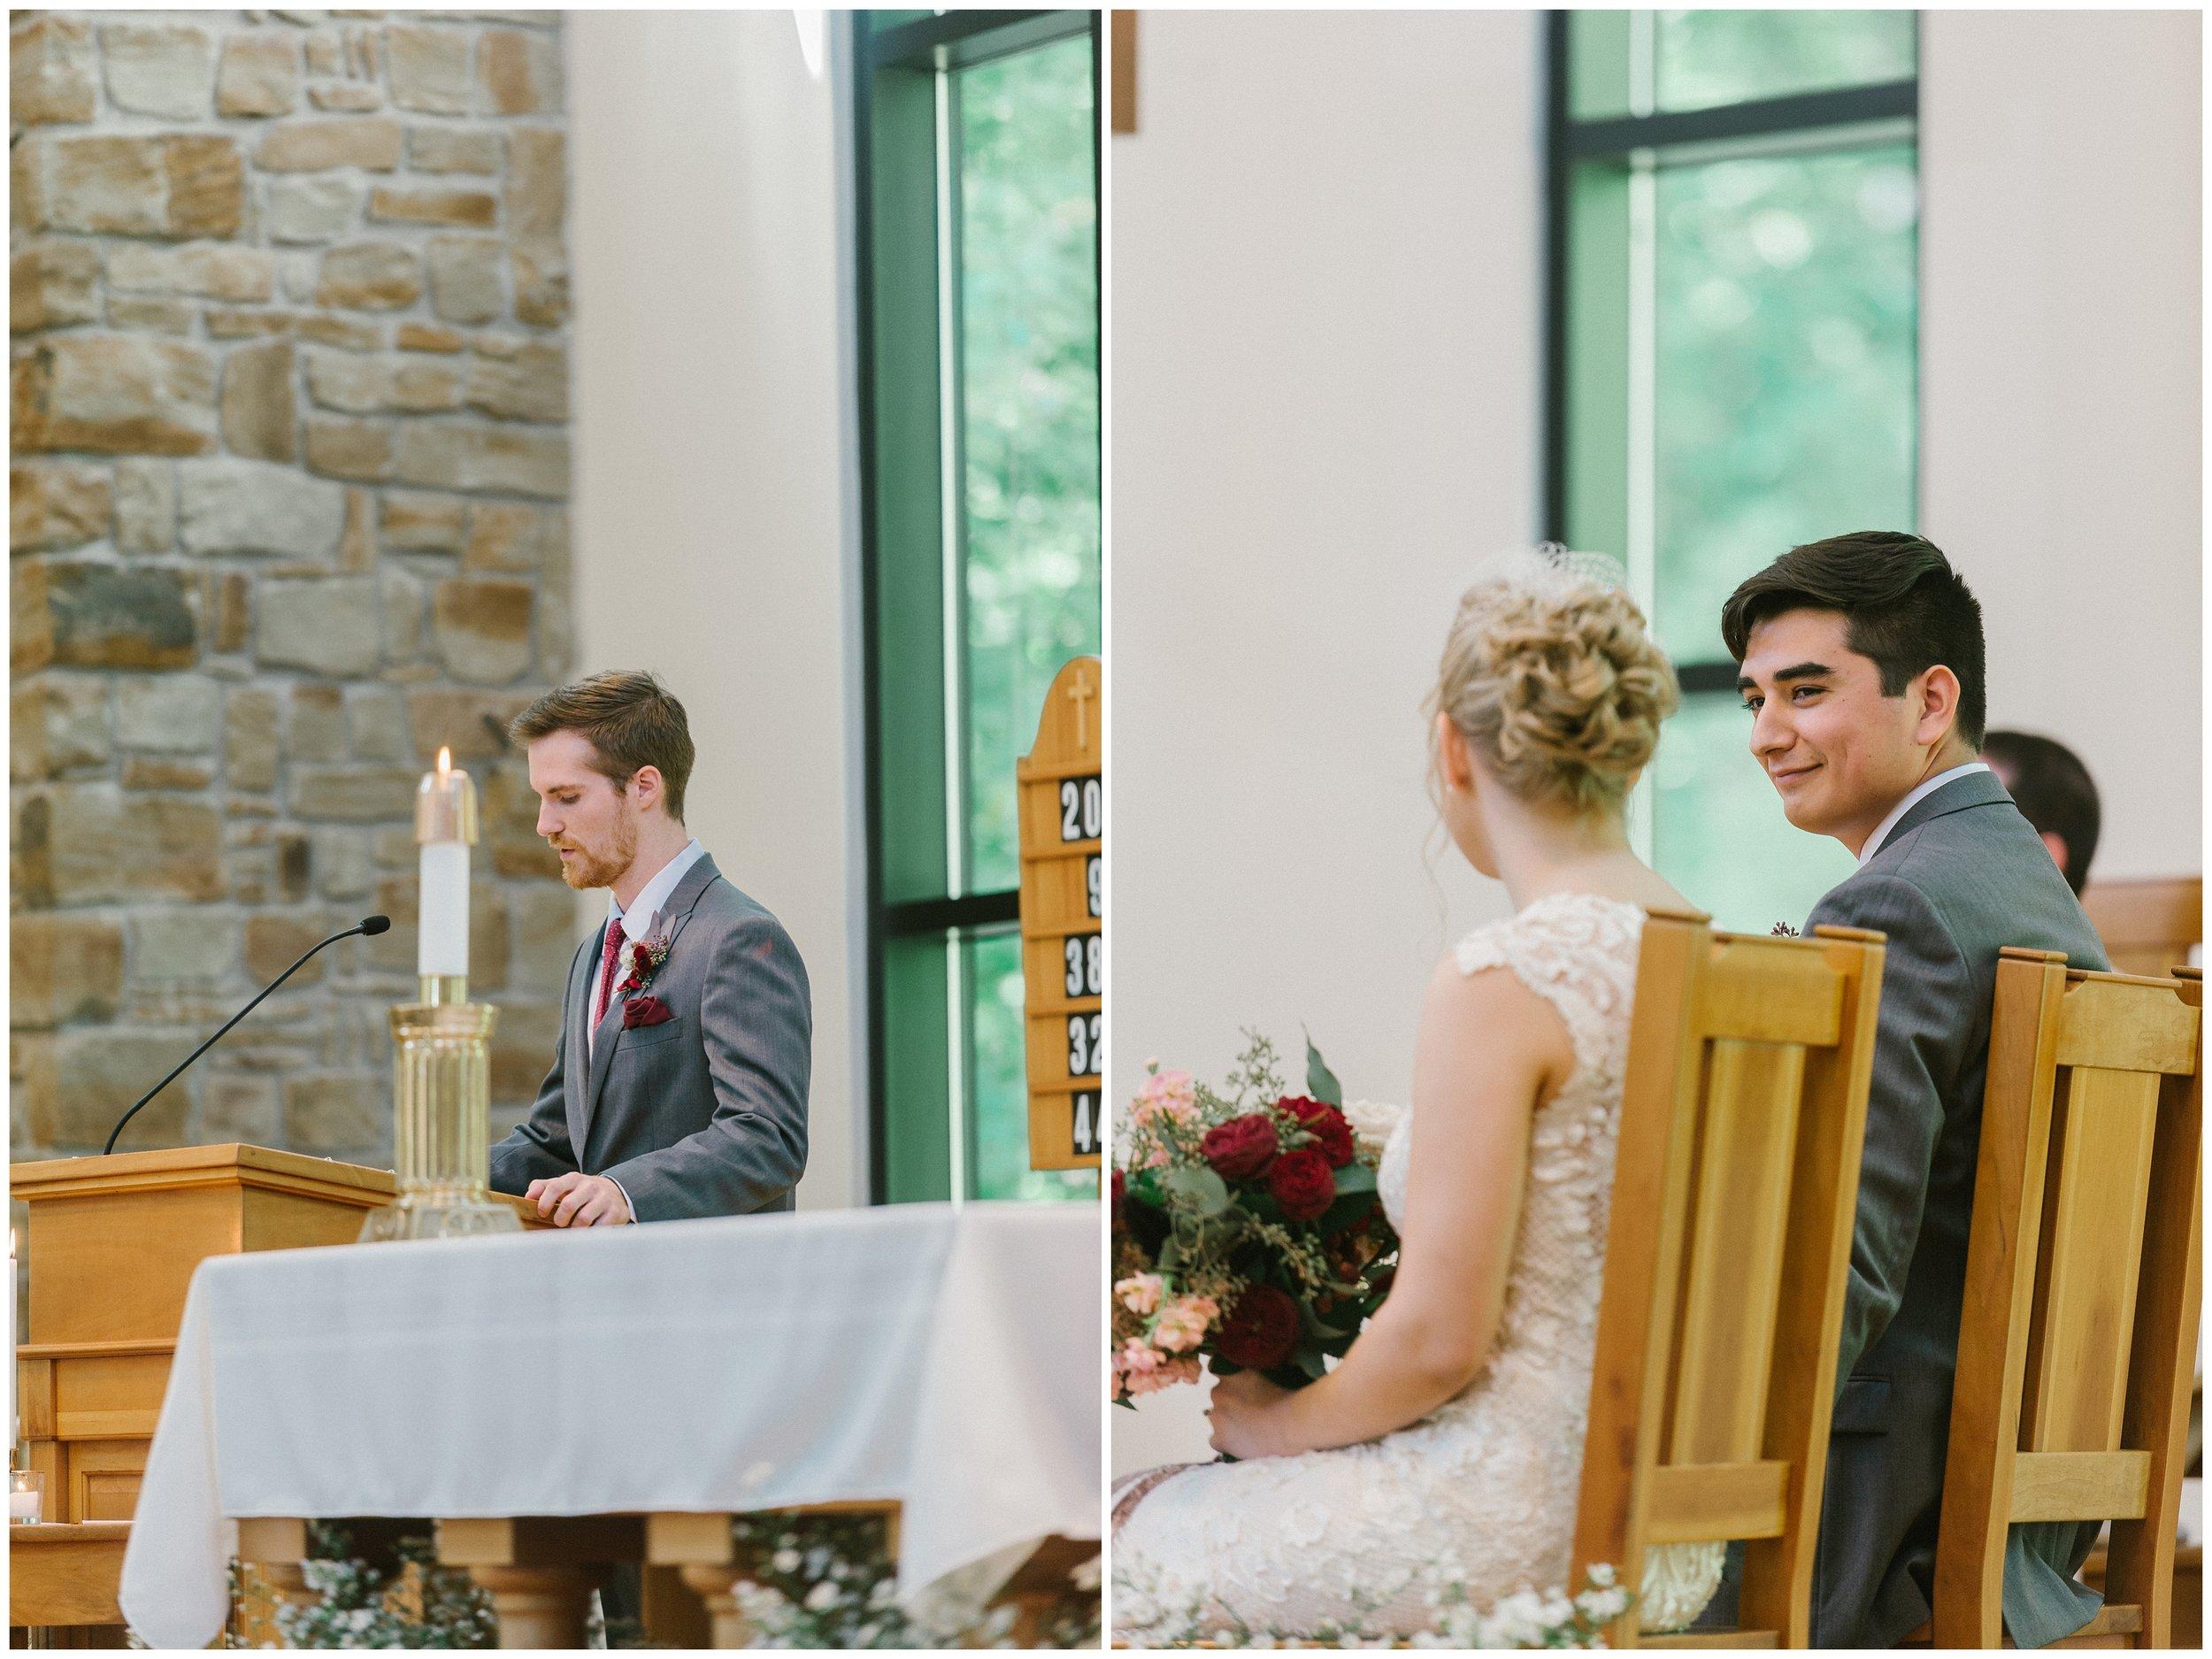 Rebecca_Shehorn_Photography_Indianapolis_Wedding_Photographer_7346.jpg